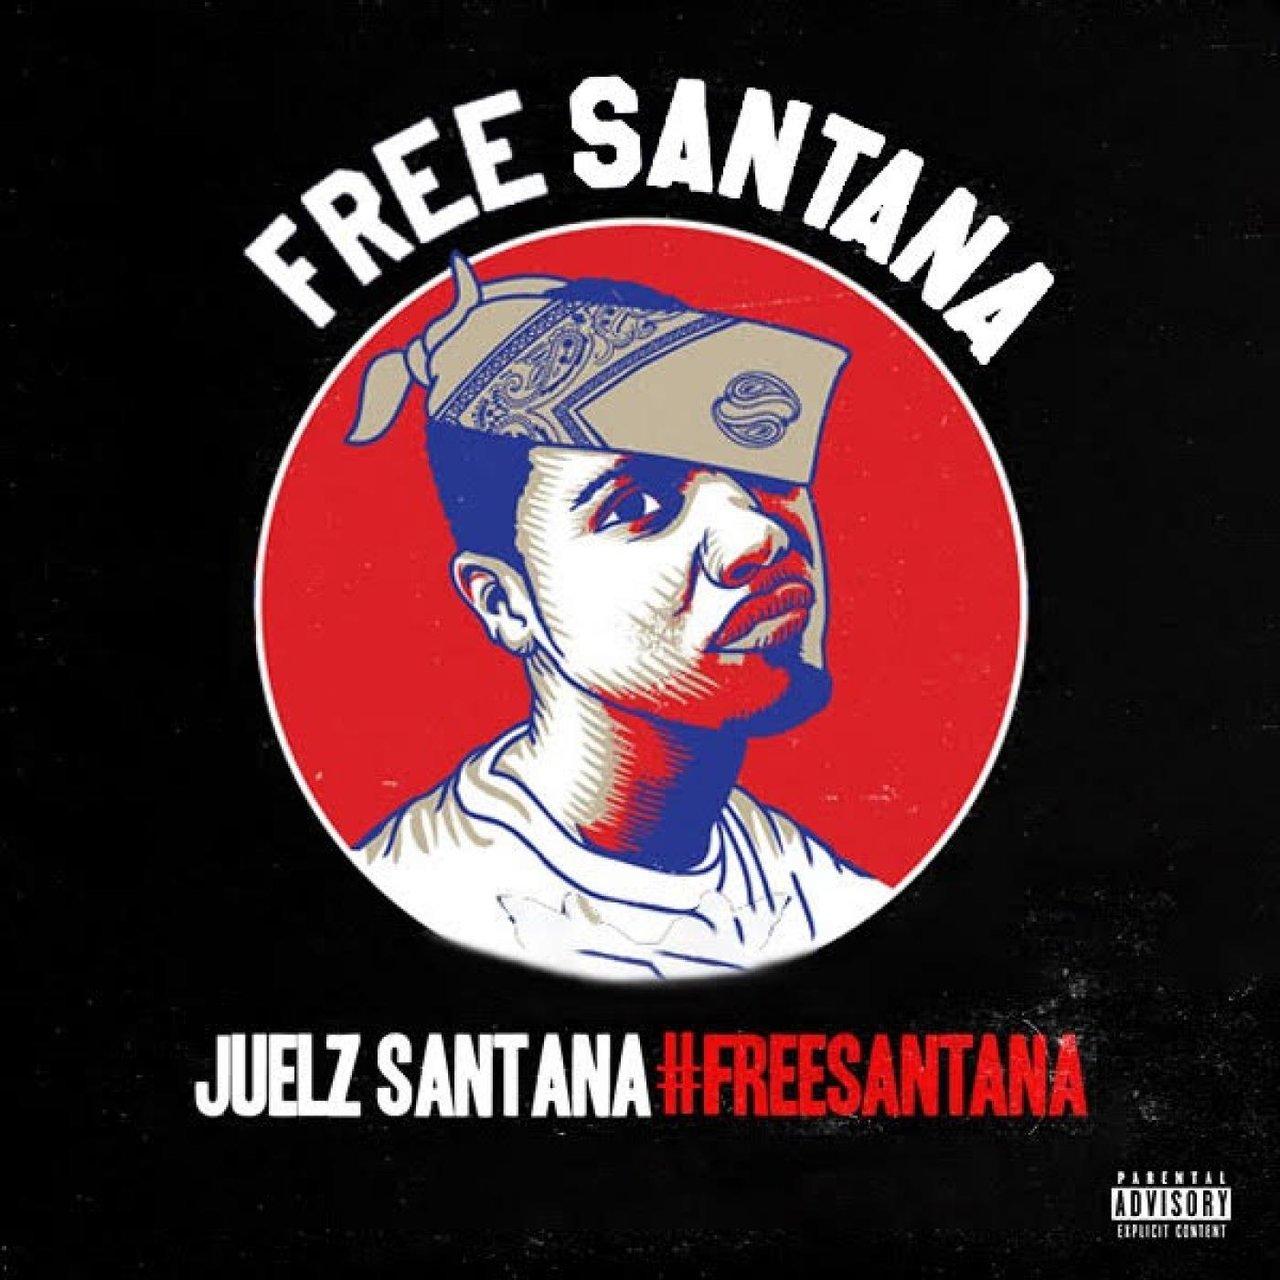 Juelz Santana - Free Santana (Cover)